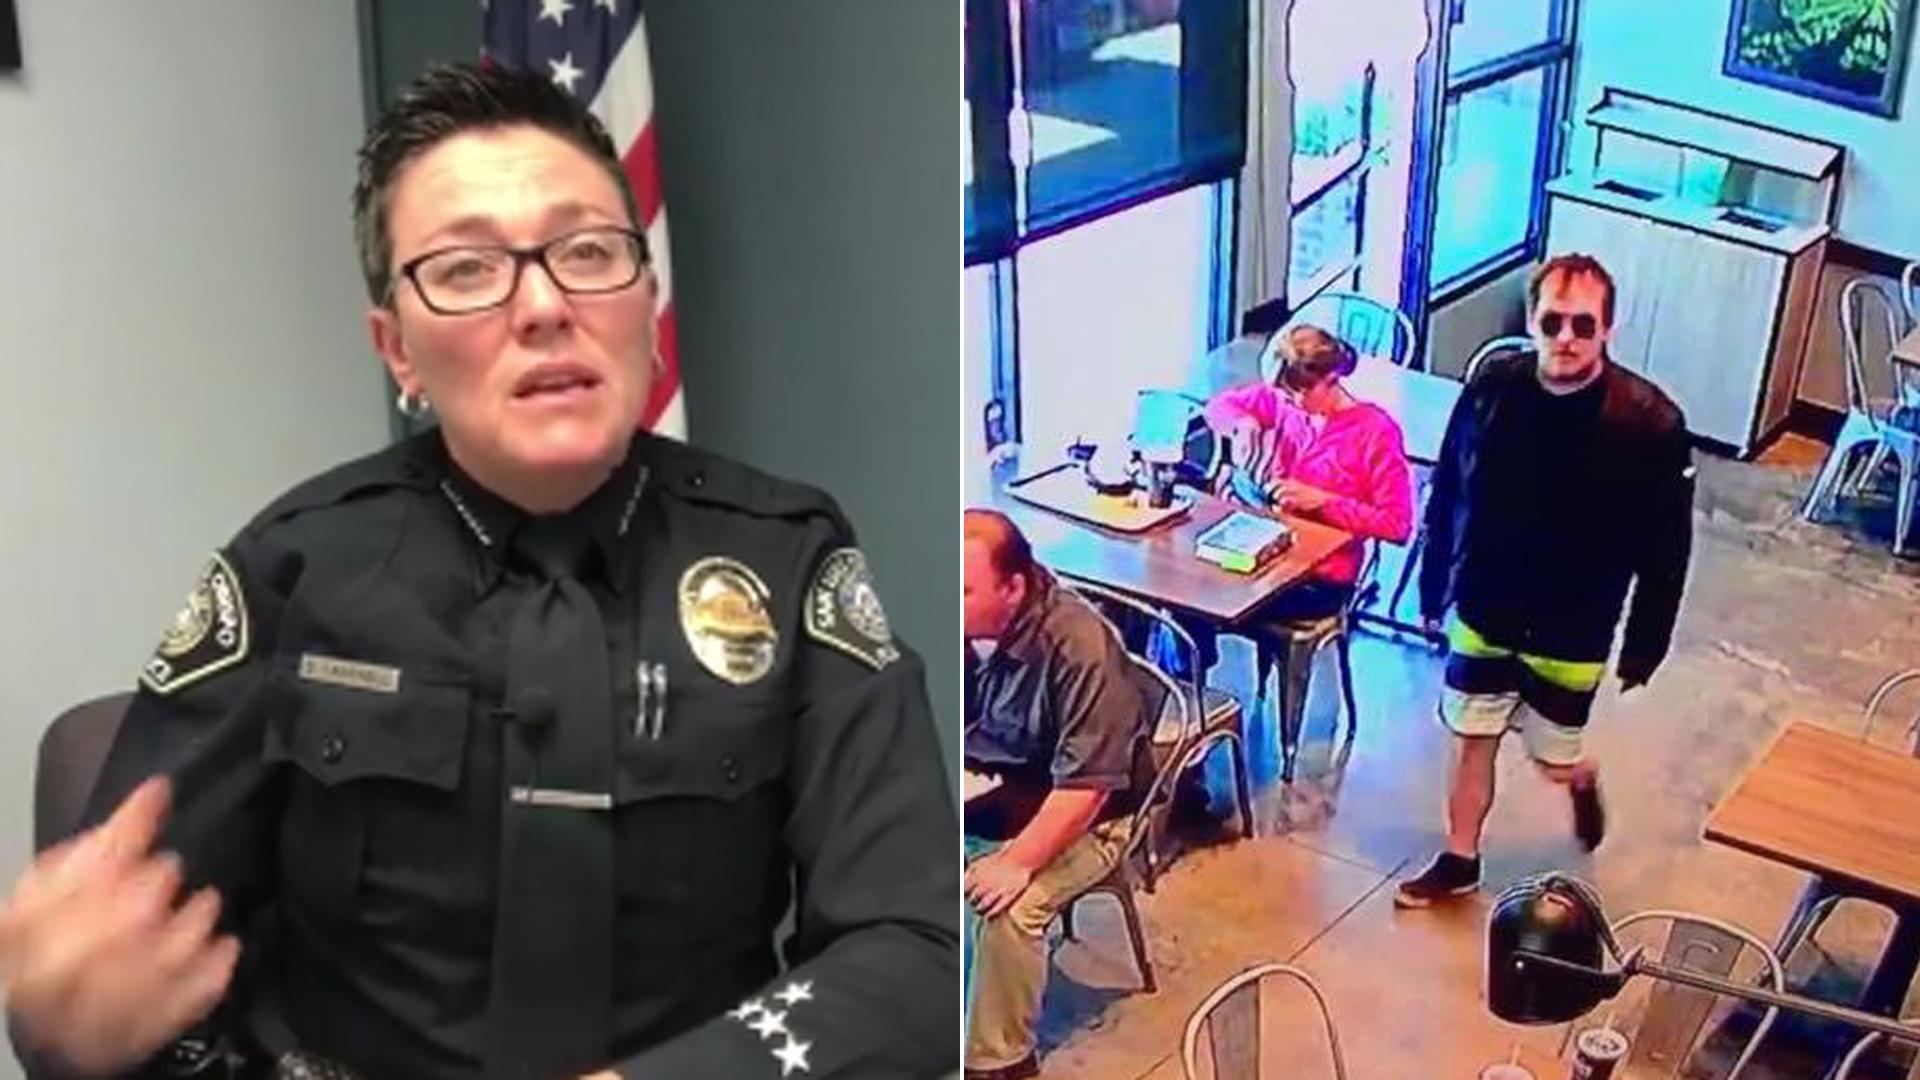 (Credit: San Luis Obispo Police Department)